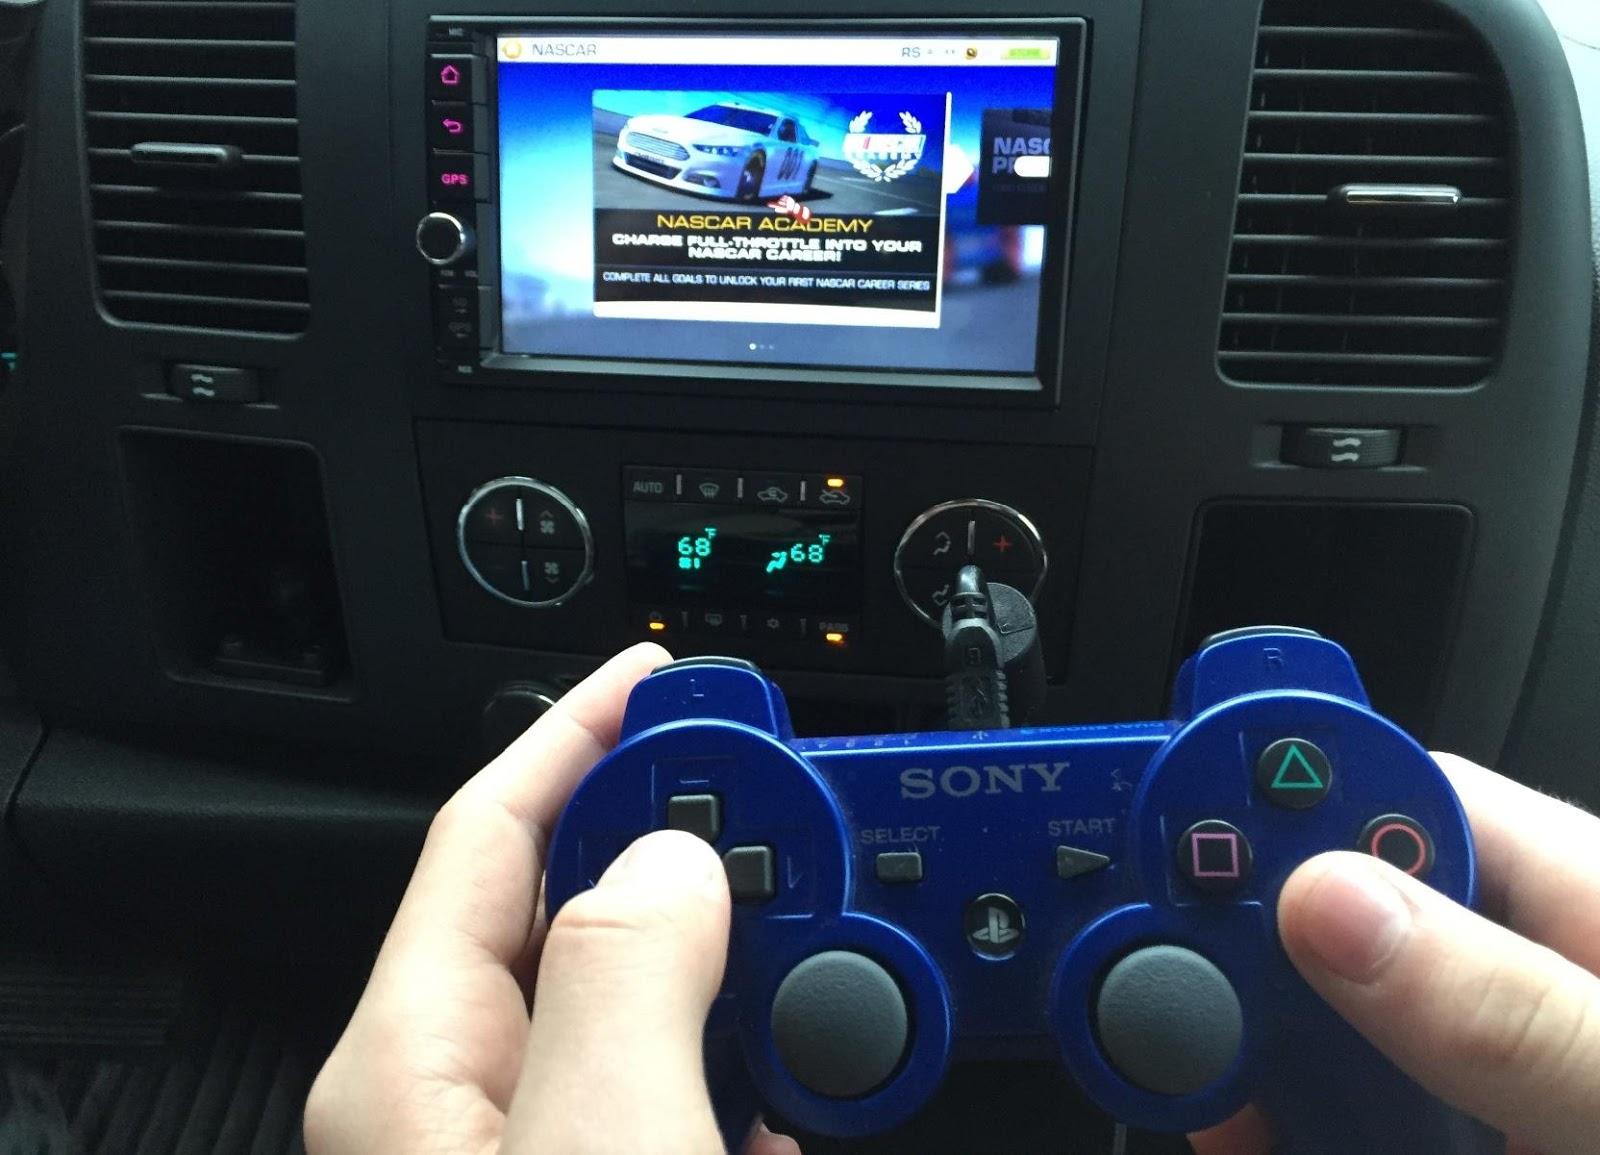 Joying Android Car Stereo: AMAZING CAR STEREO